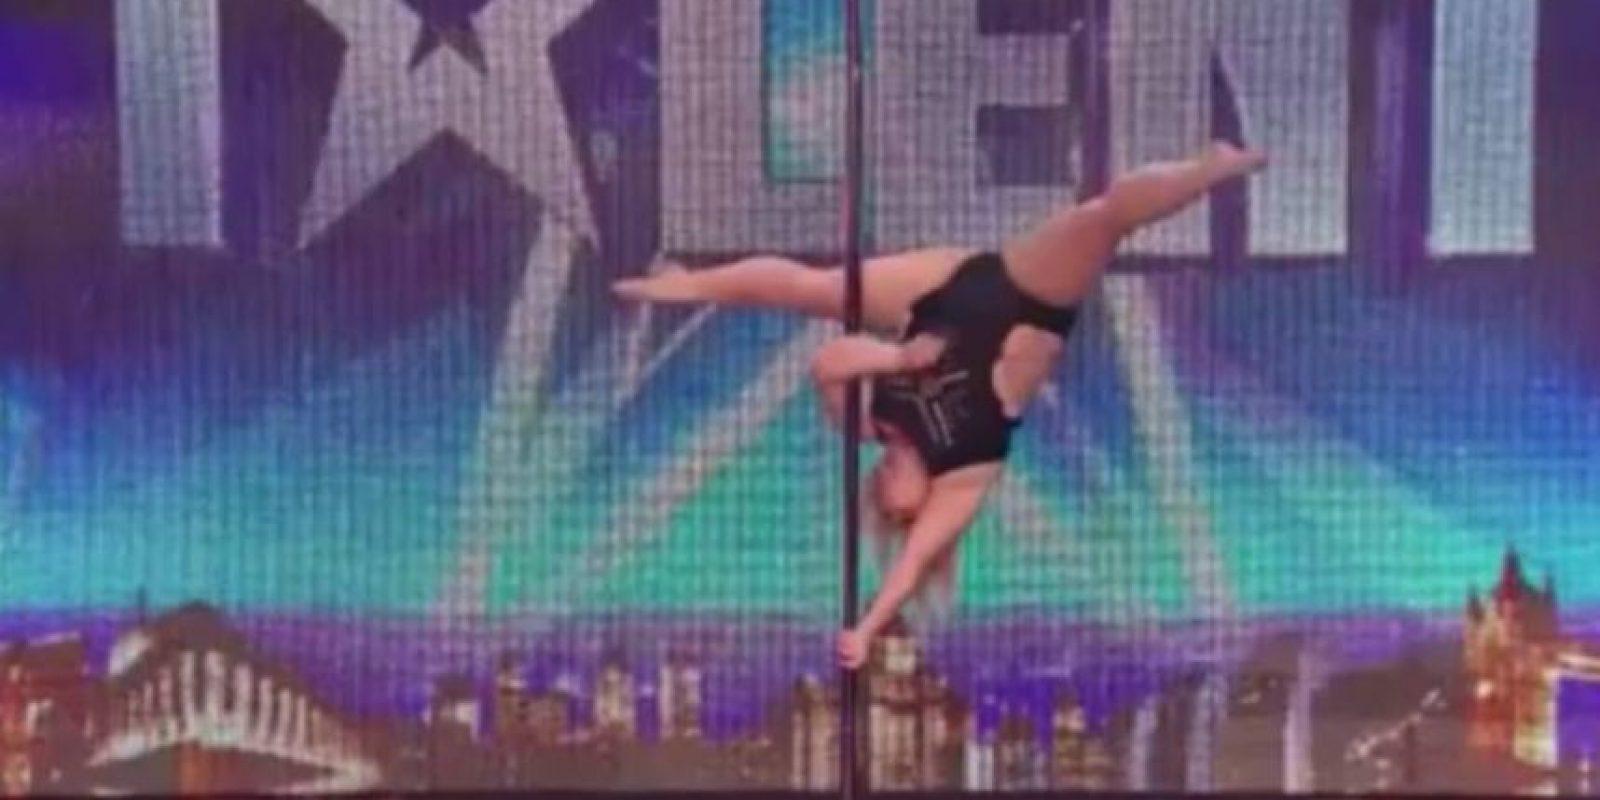 2. Pole dance: Emma Haslam impresionó en Britain´s Got Talent. Pesa 95 kilos. Foto:vía Instagram/jessamynstanley